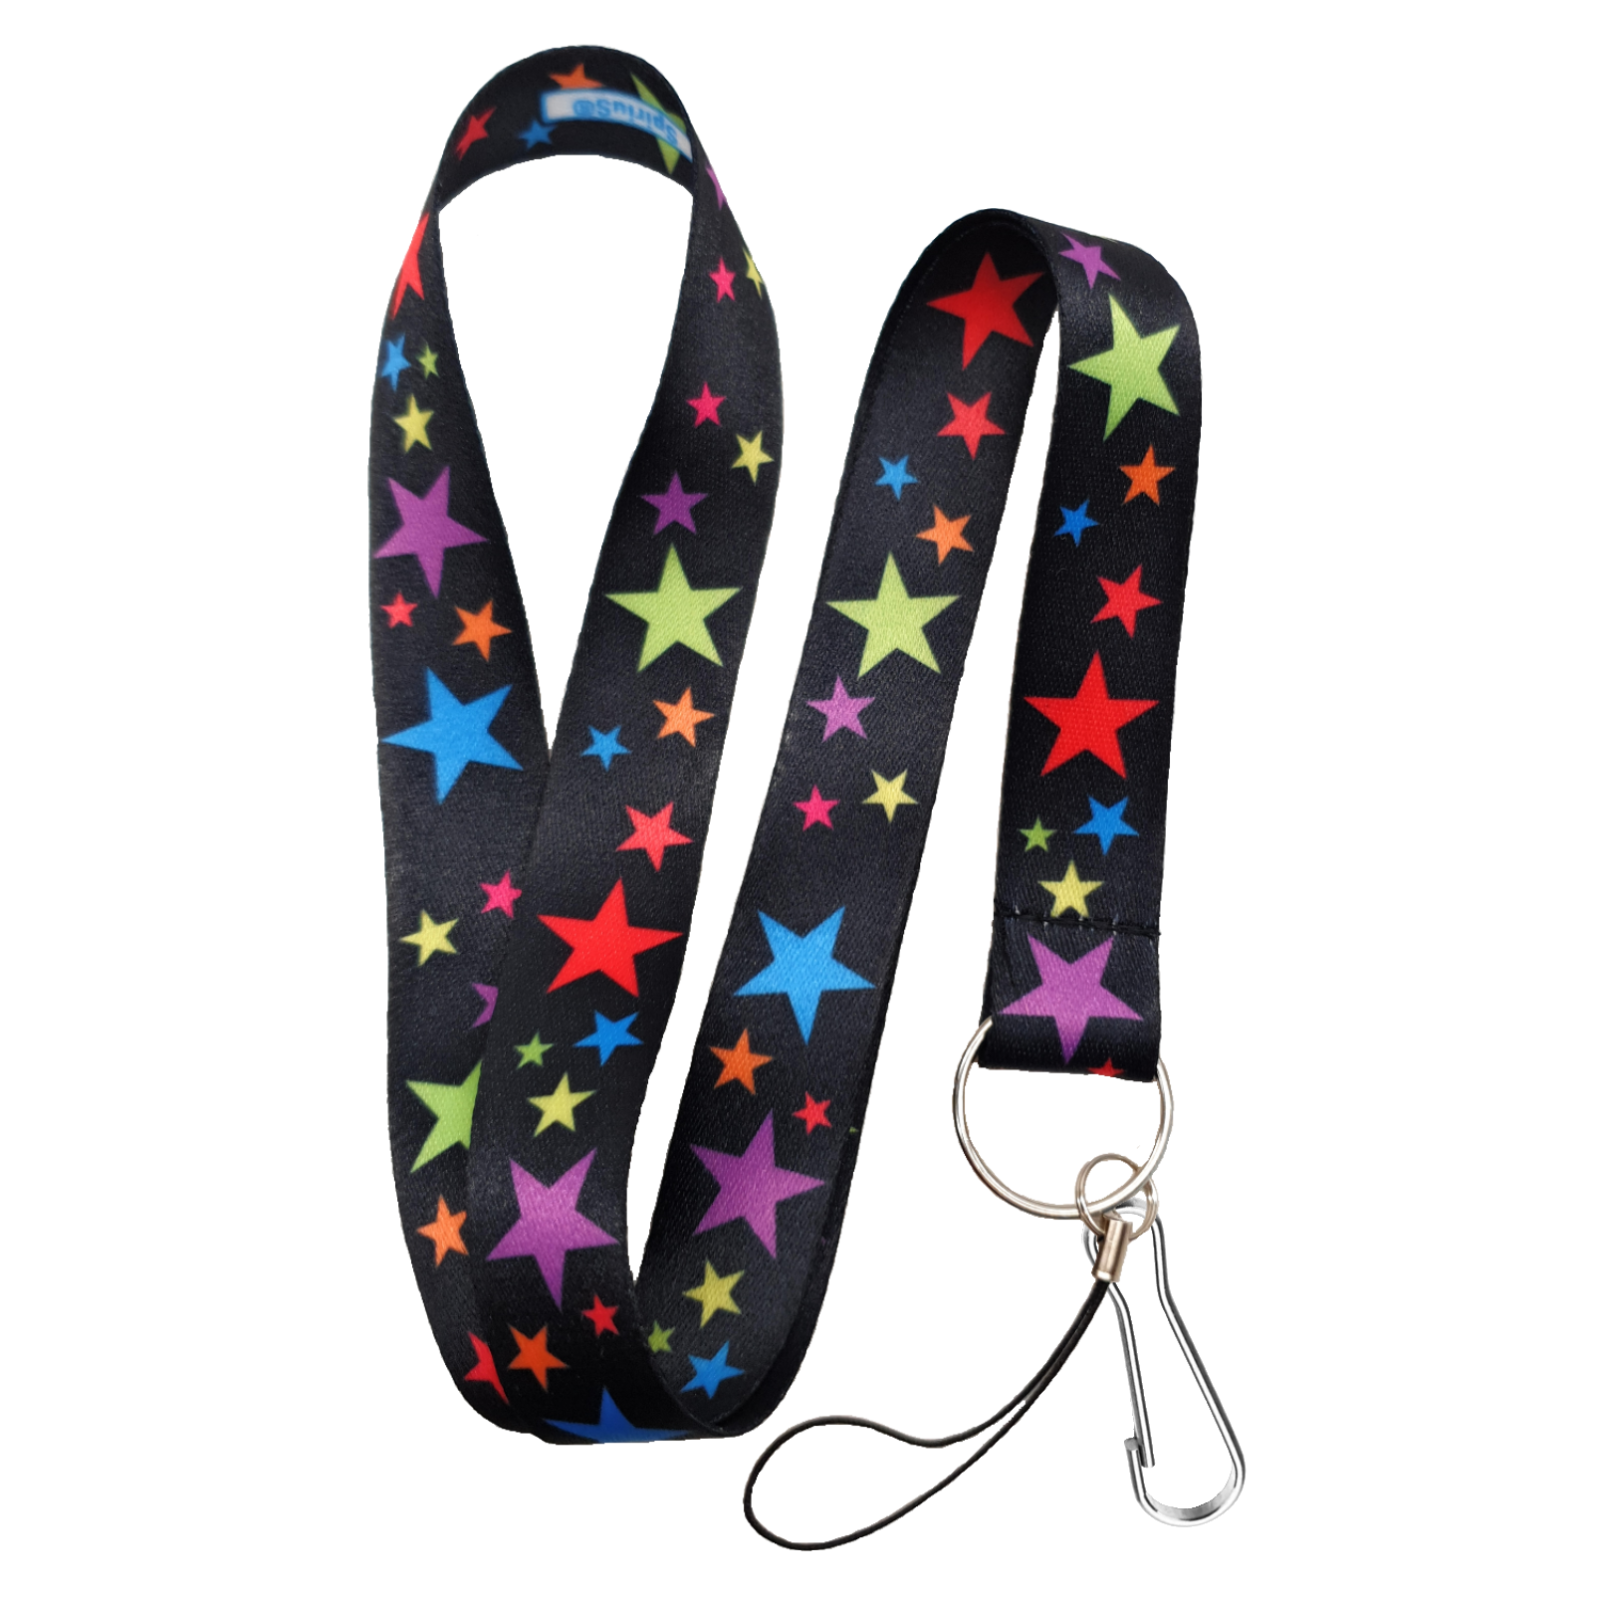 Phone /& Keys Lanyard Neck Strap Bubbles Spots Daisy /& Stars for ID Badge